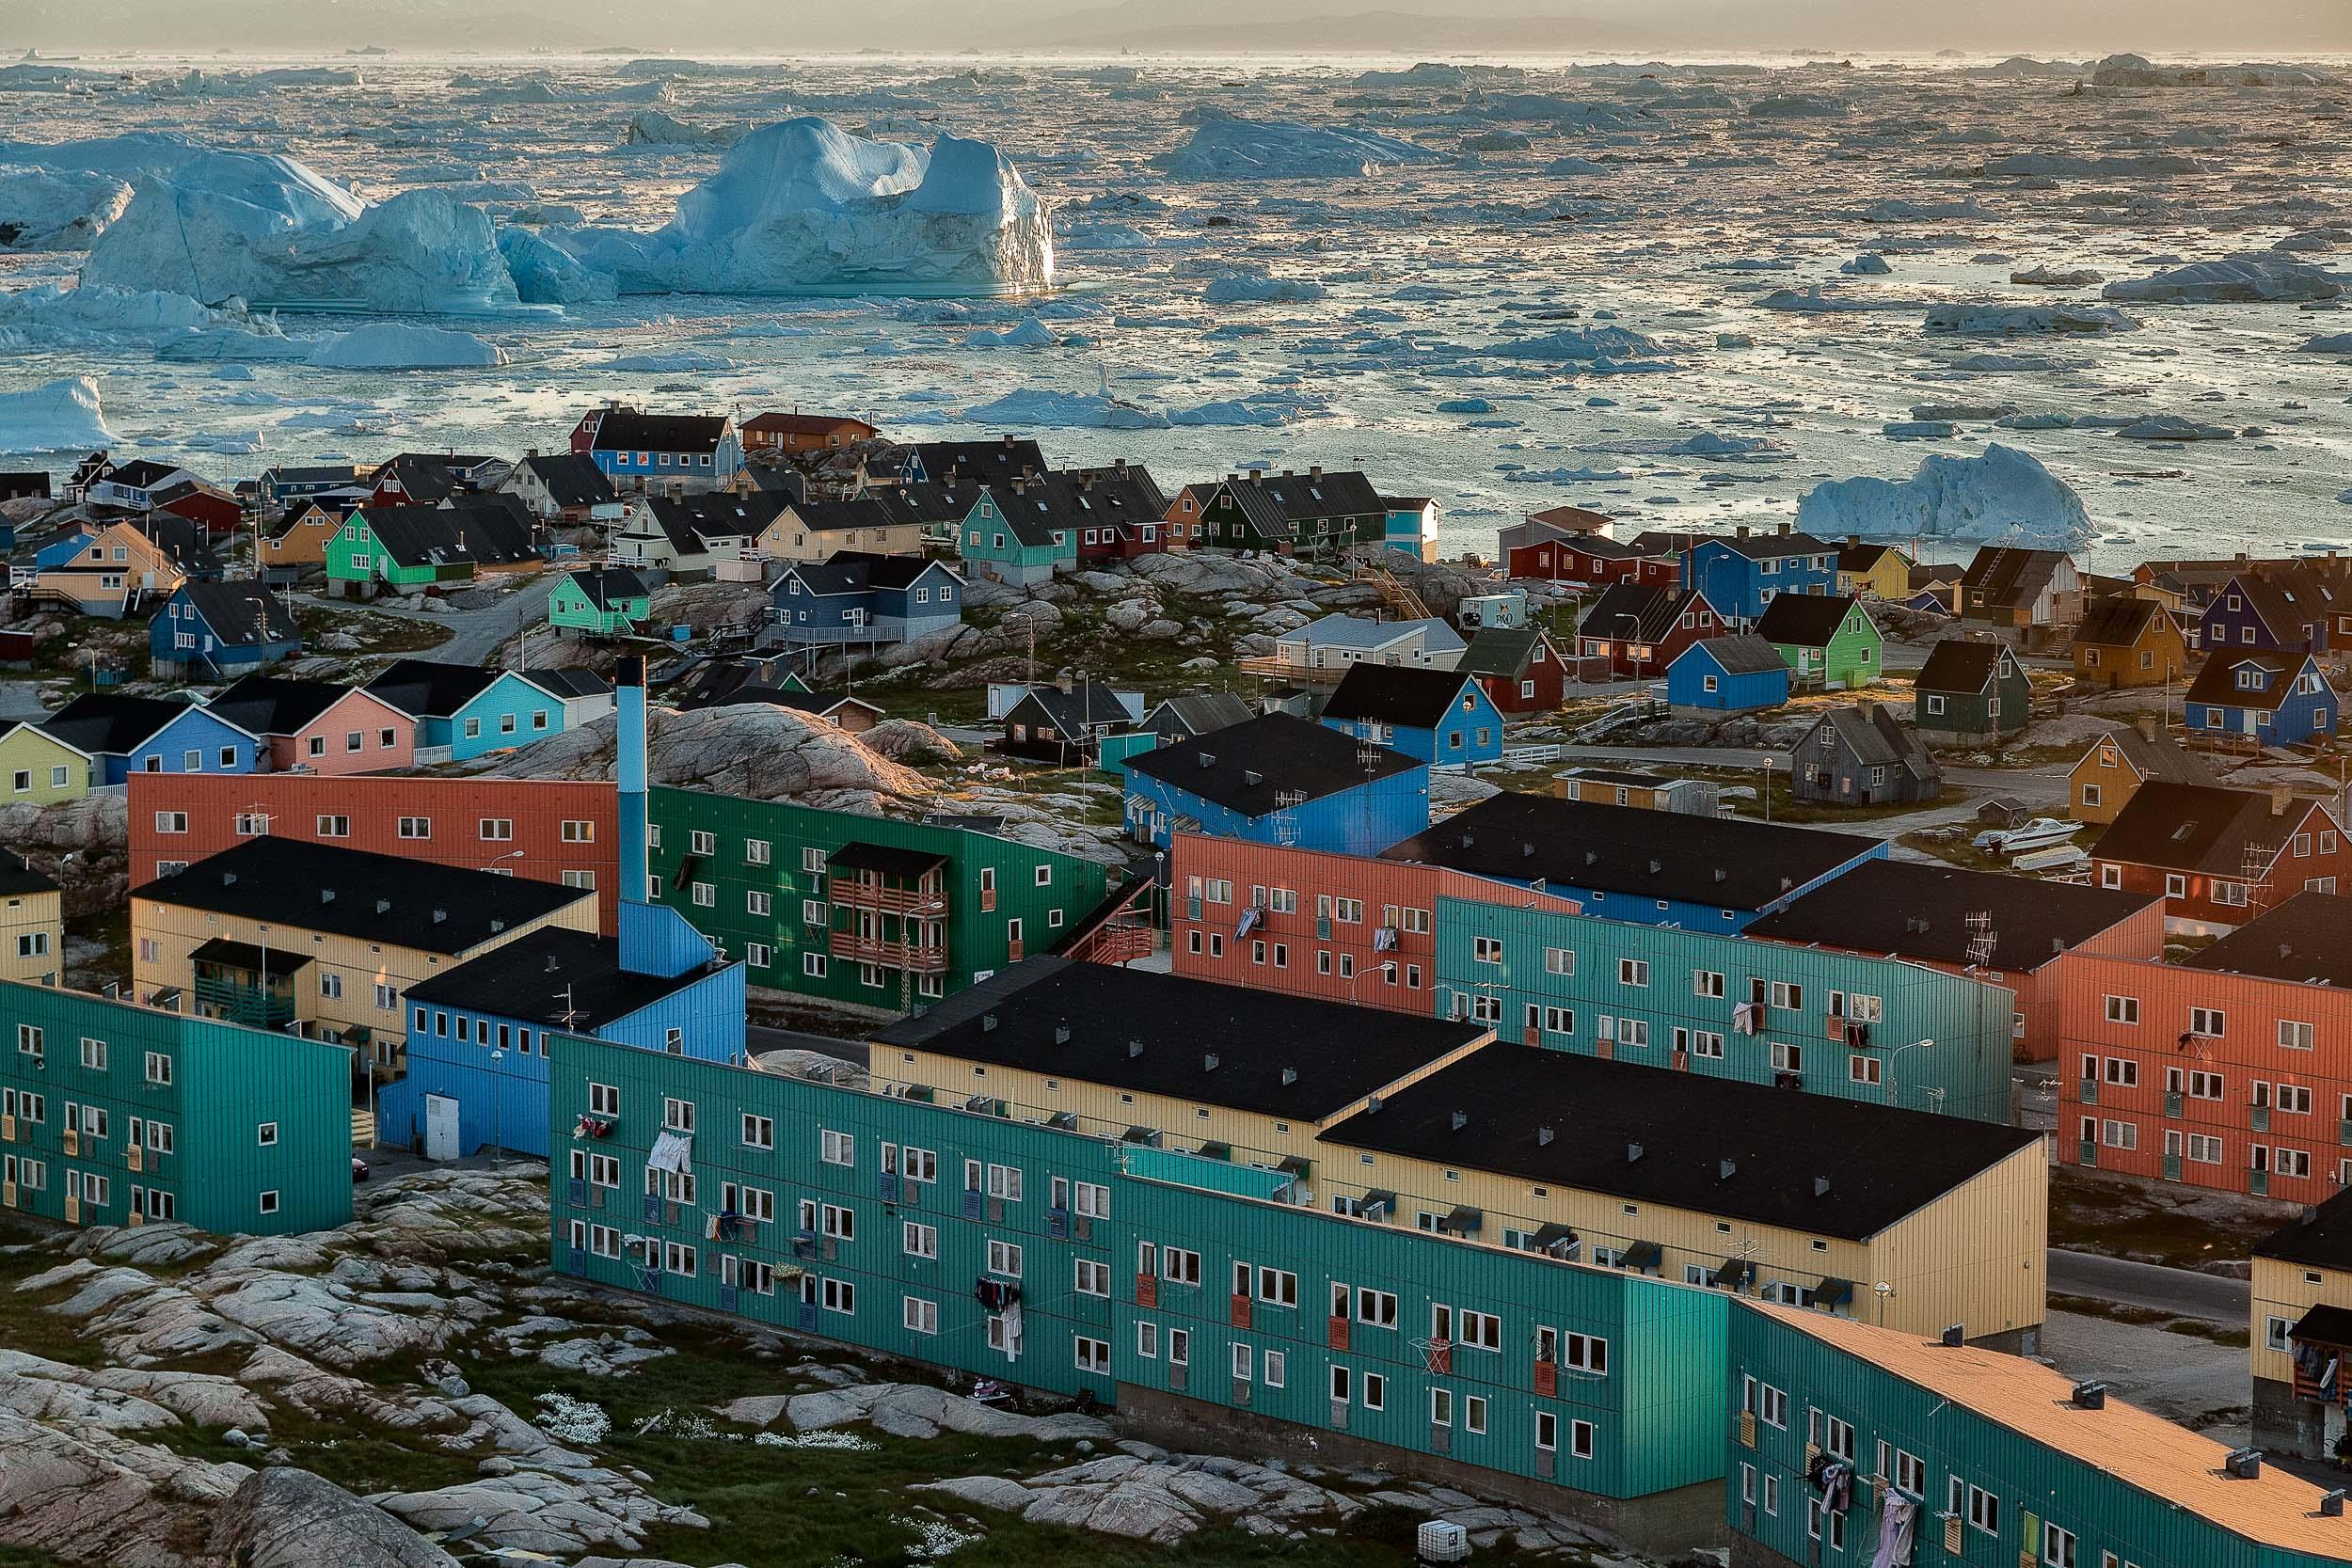 Public housing    on the shores of the Ilulissat Icefjord,    Ilulissat, Greenland   .